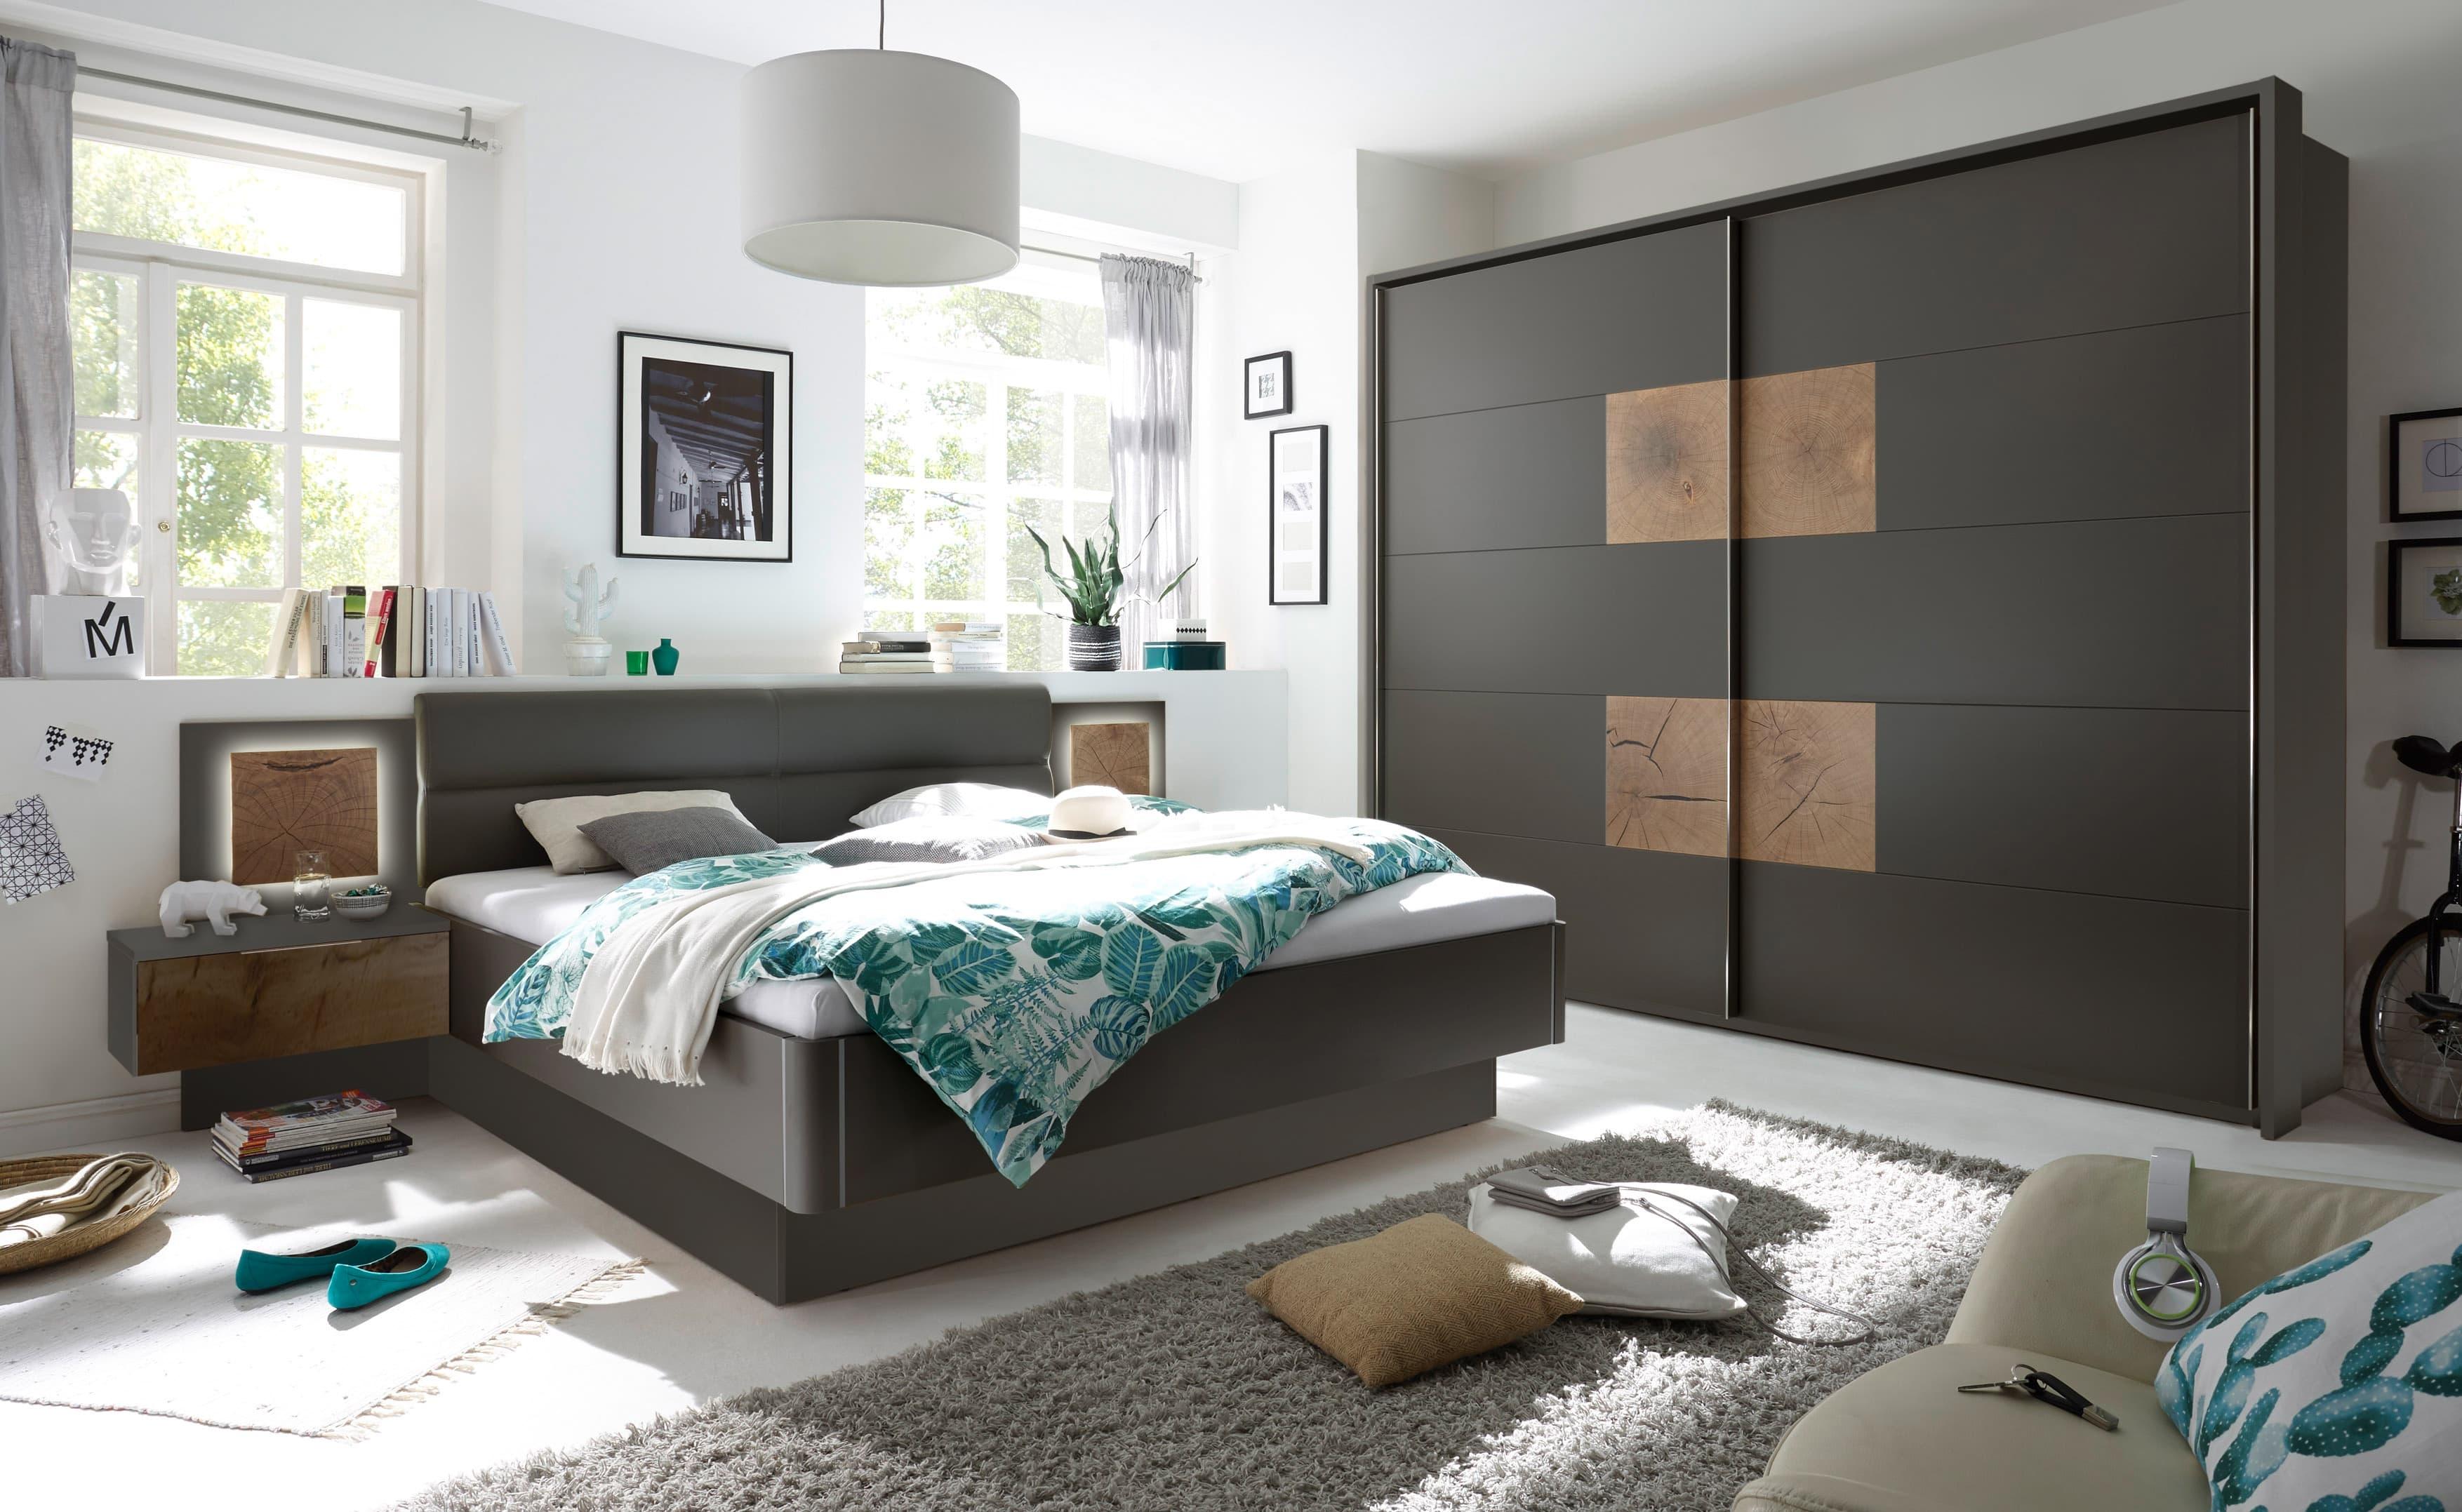 Set Mobila Dormitor din pal si piele ecologica, cu pat 200 x 180 cm, 2 piese Cappy Antracit / Natural poza